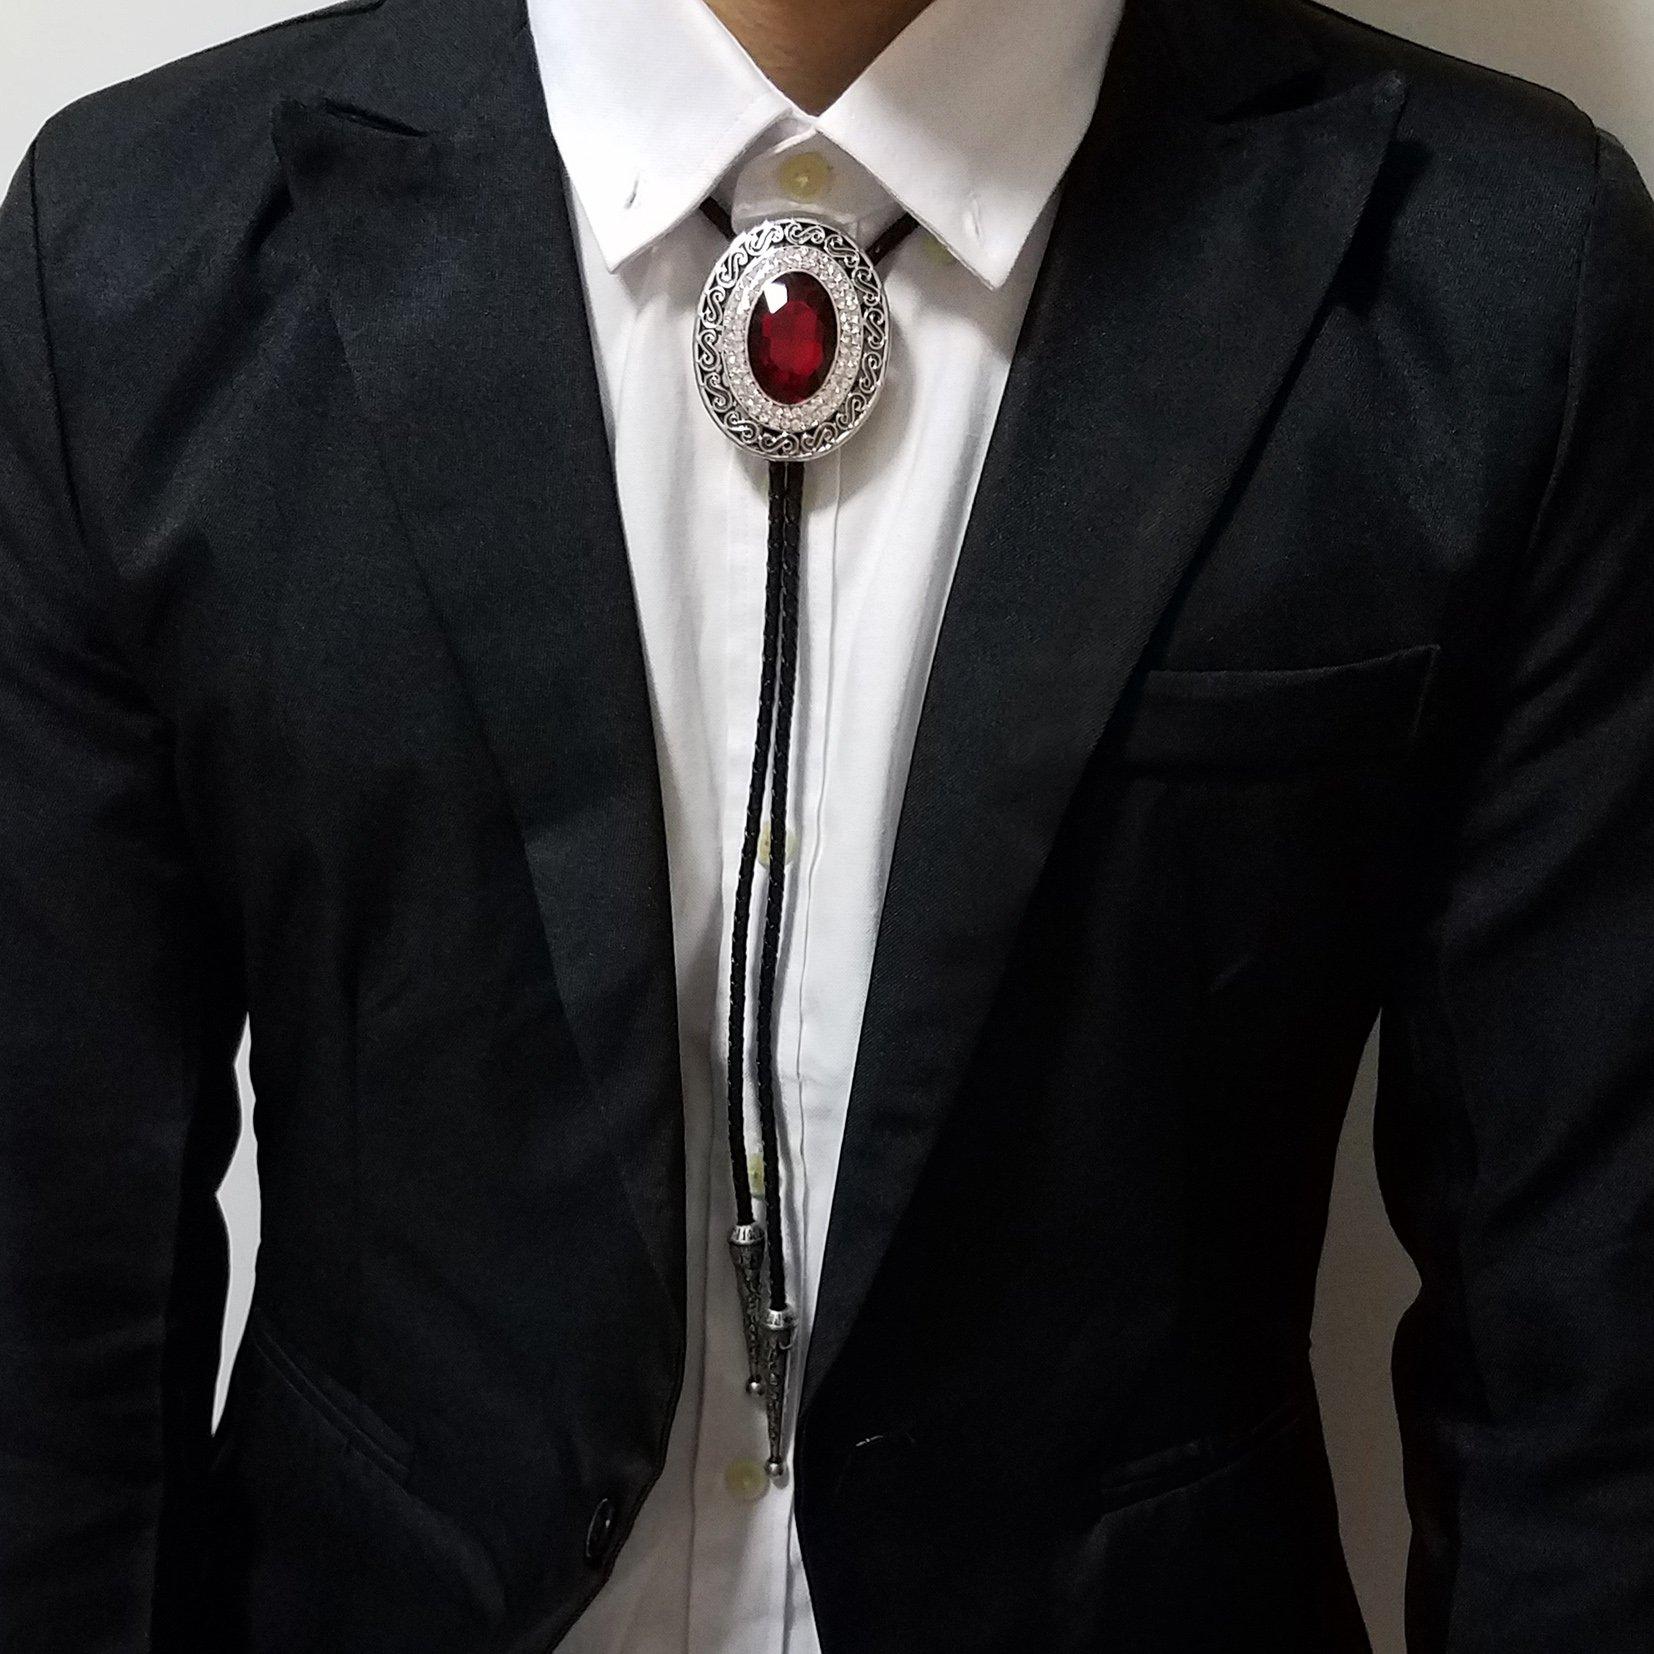 SELOVO Western Big Large Red Rhinestone Western Bolo Tie Genuine Leather Silver Tone by SELOVO (Image #3)